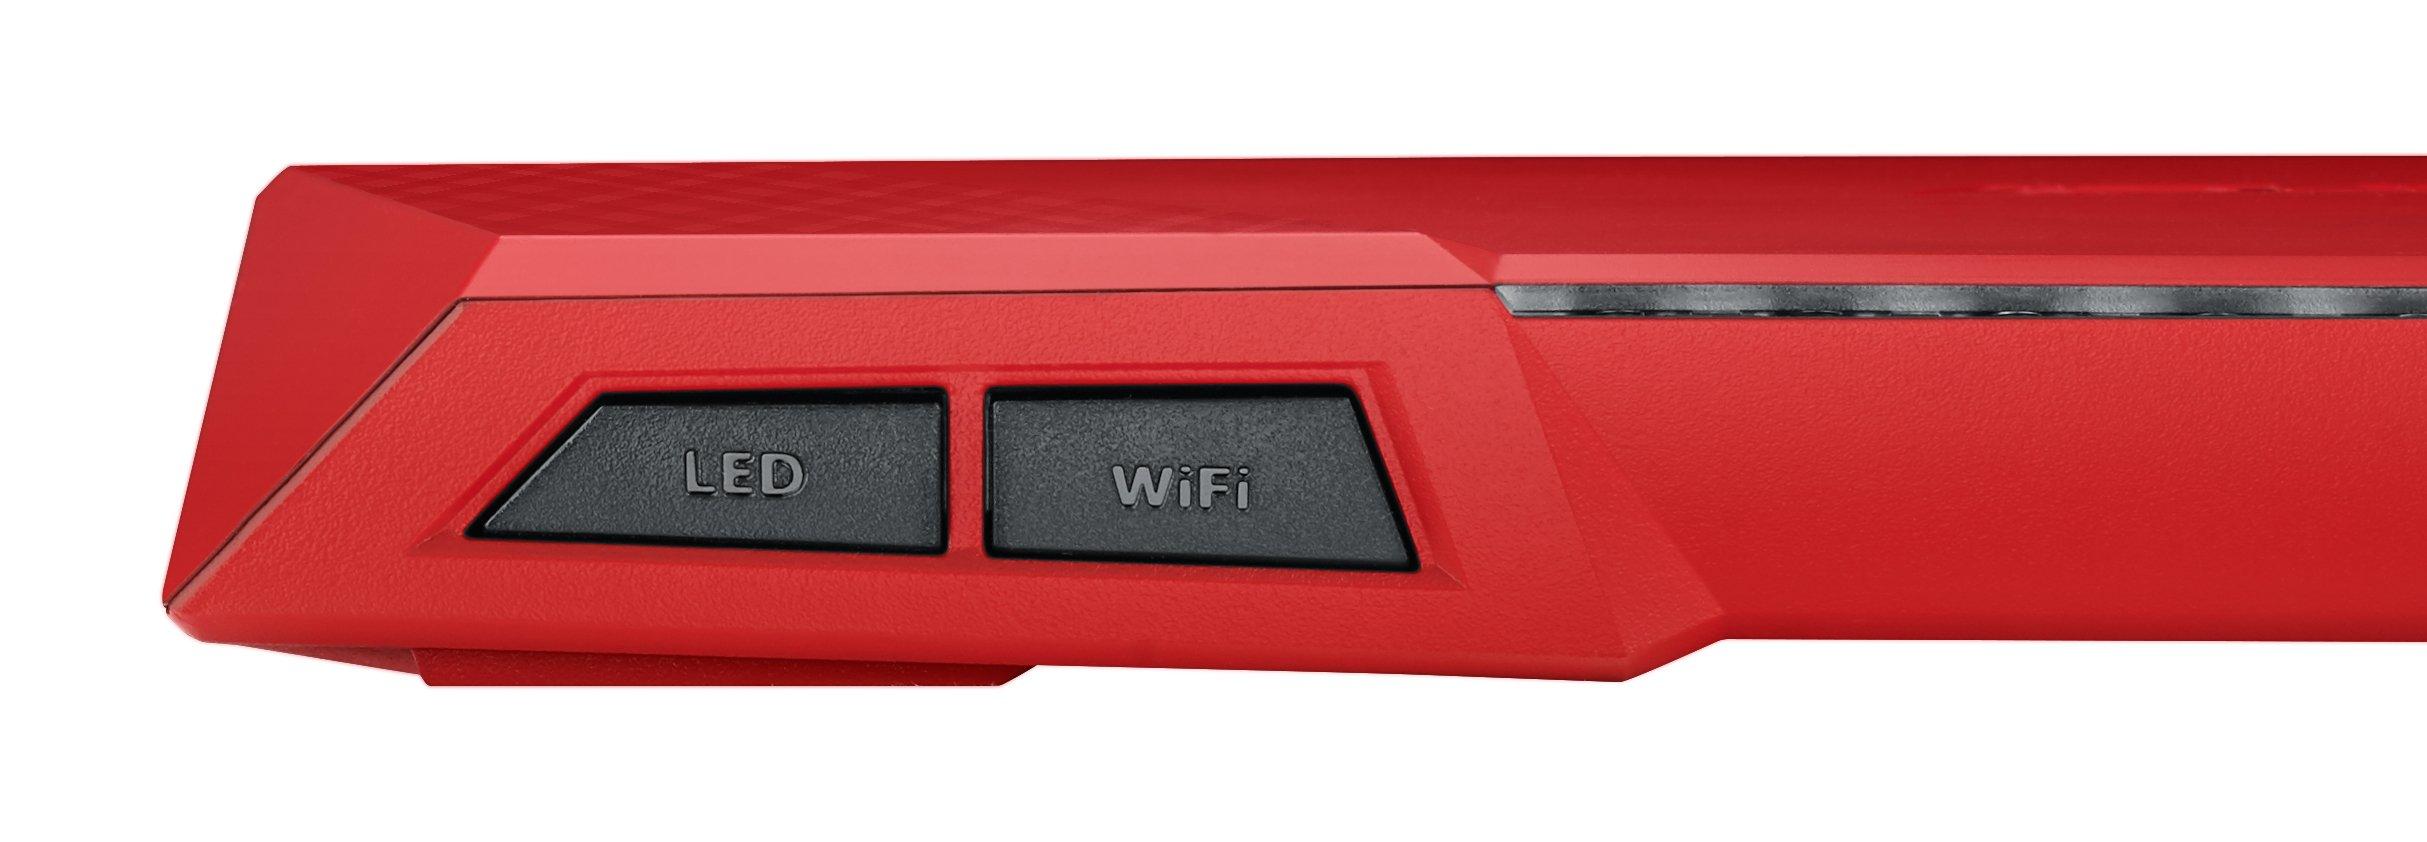 Asus RT-AC87U RED AC2400 Dual-Band Power WLAN Router (802.11 a/b/g/n/ac, Gigabit LAN/WAN, USB 3.0, Print FTP UPnP VPN…